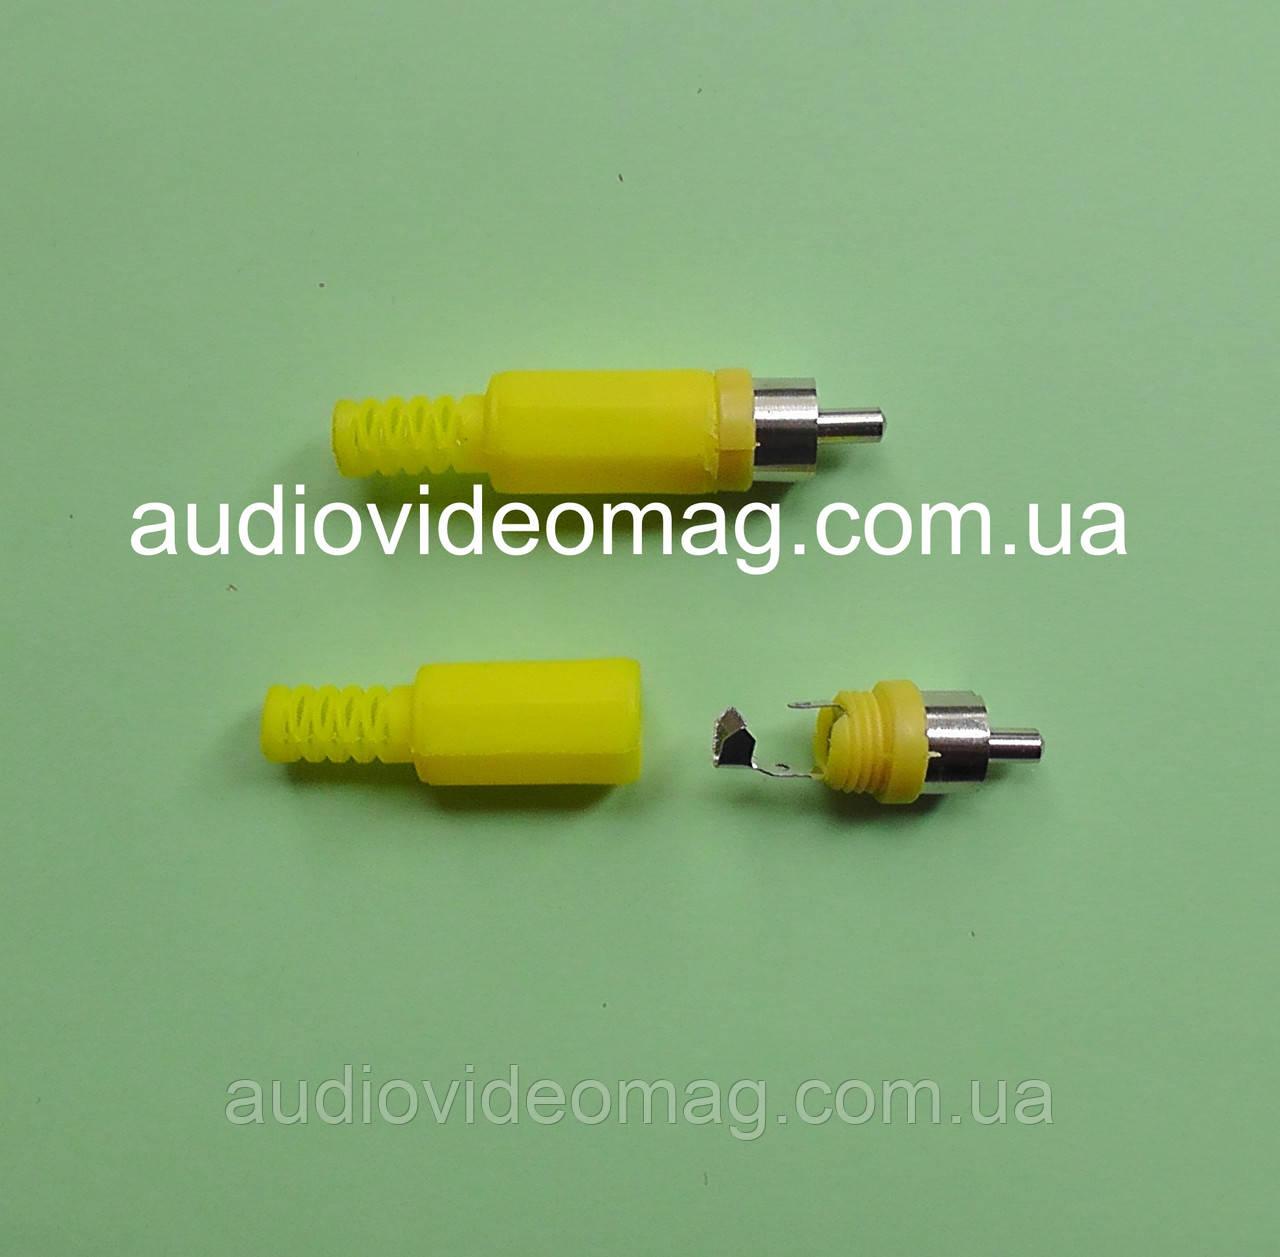 Штекер RCA (тюльпан), пластиковый, цвет желтый